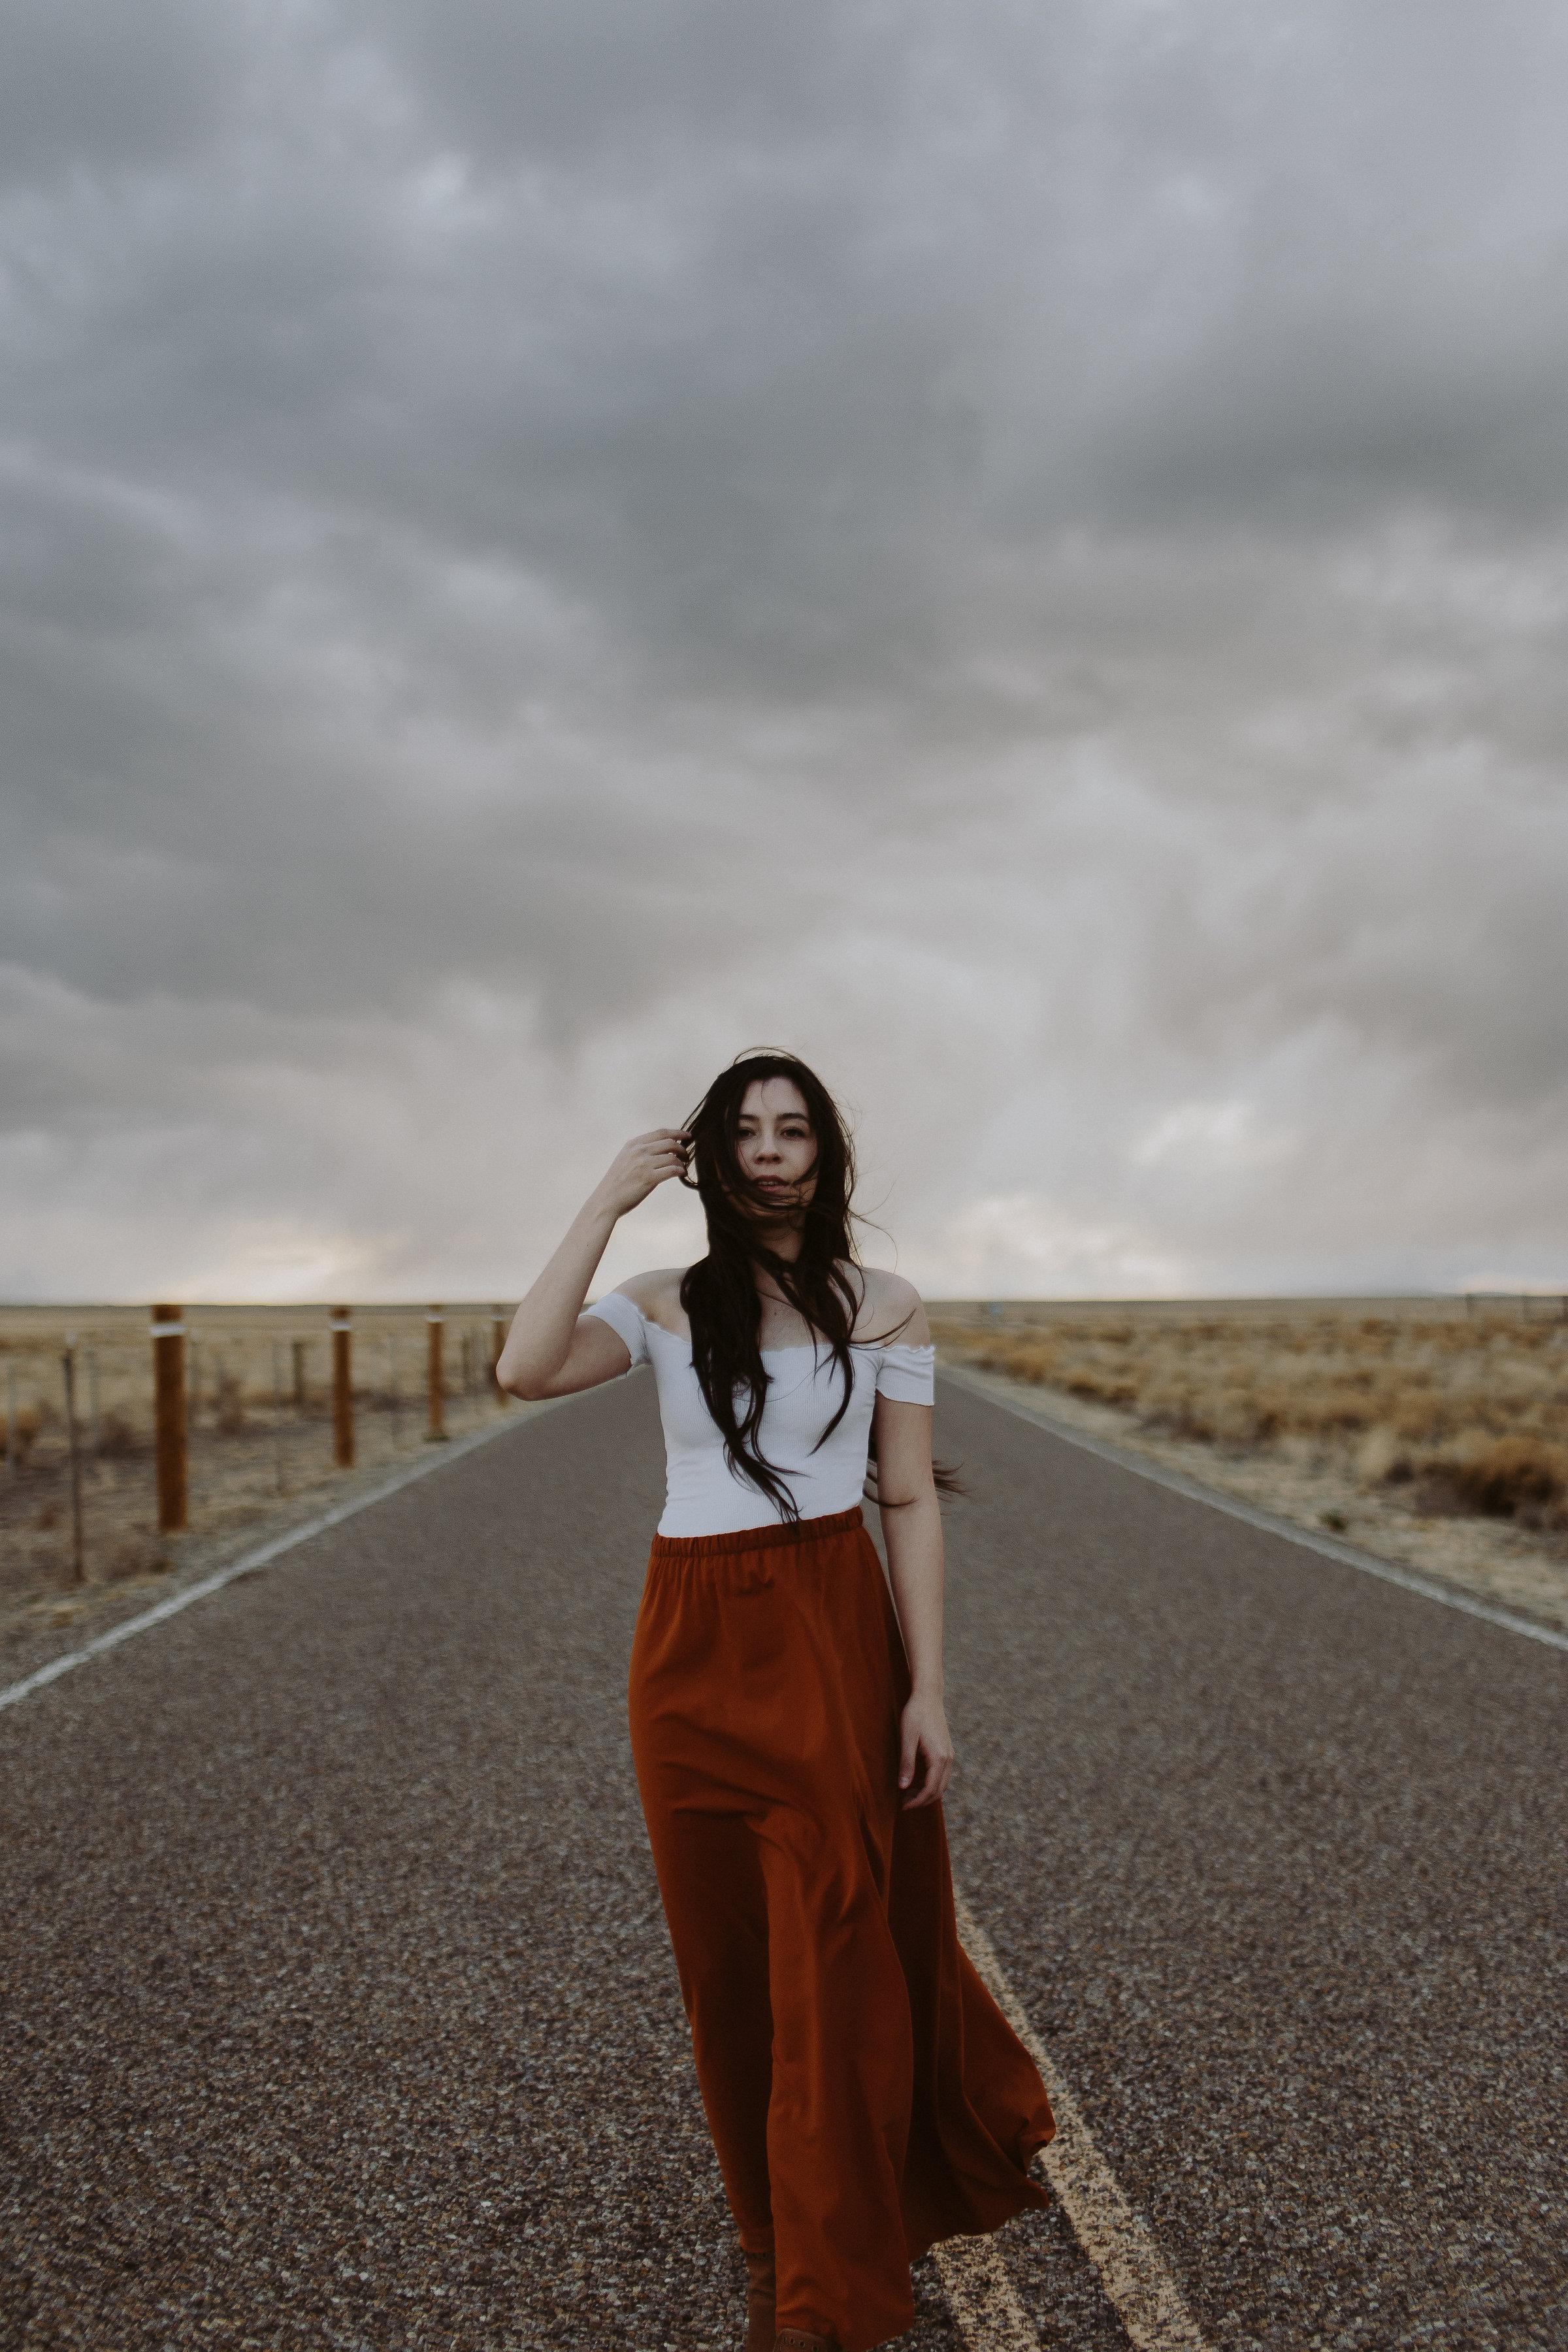 Images by Sydney Payne